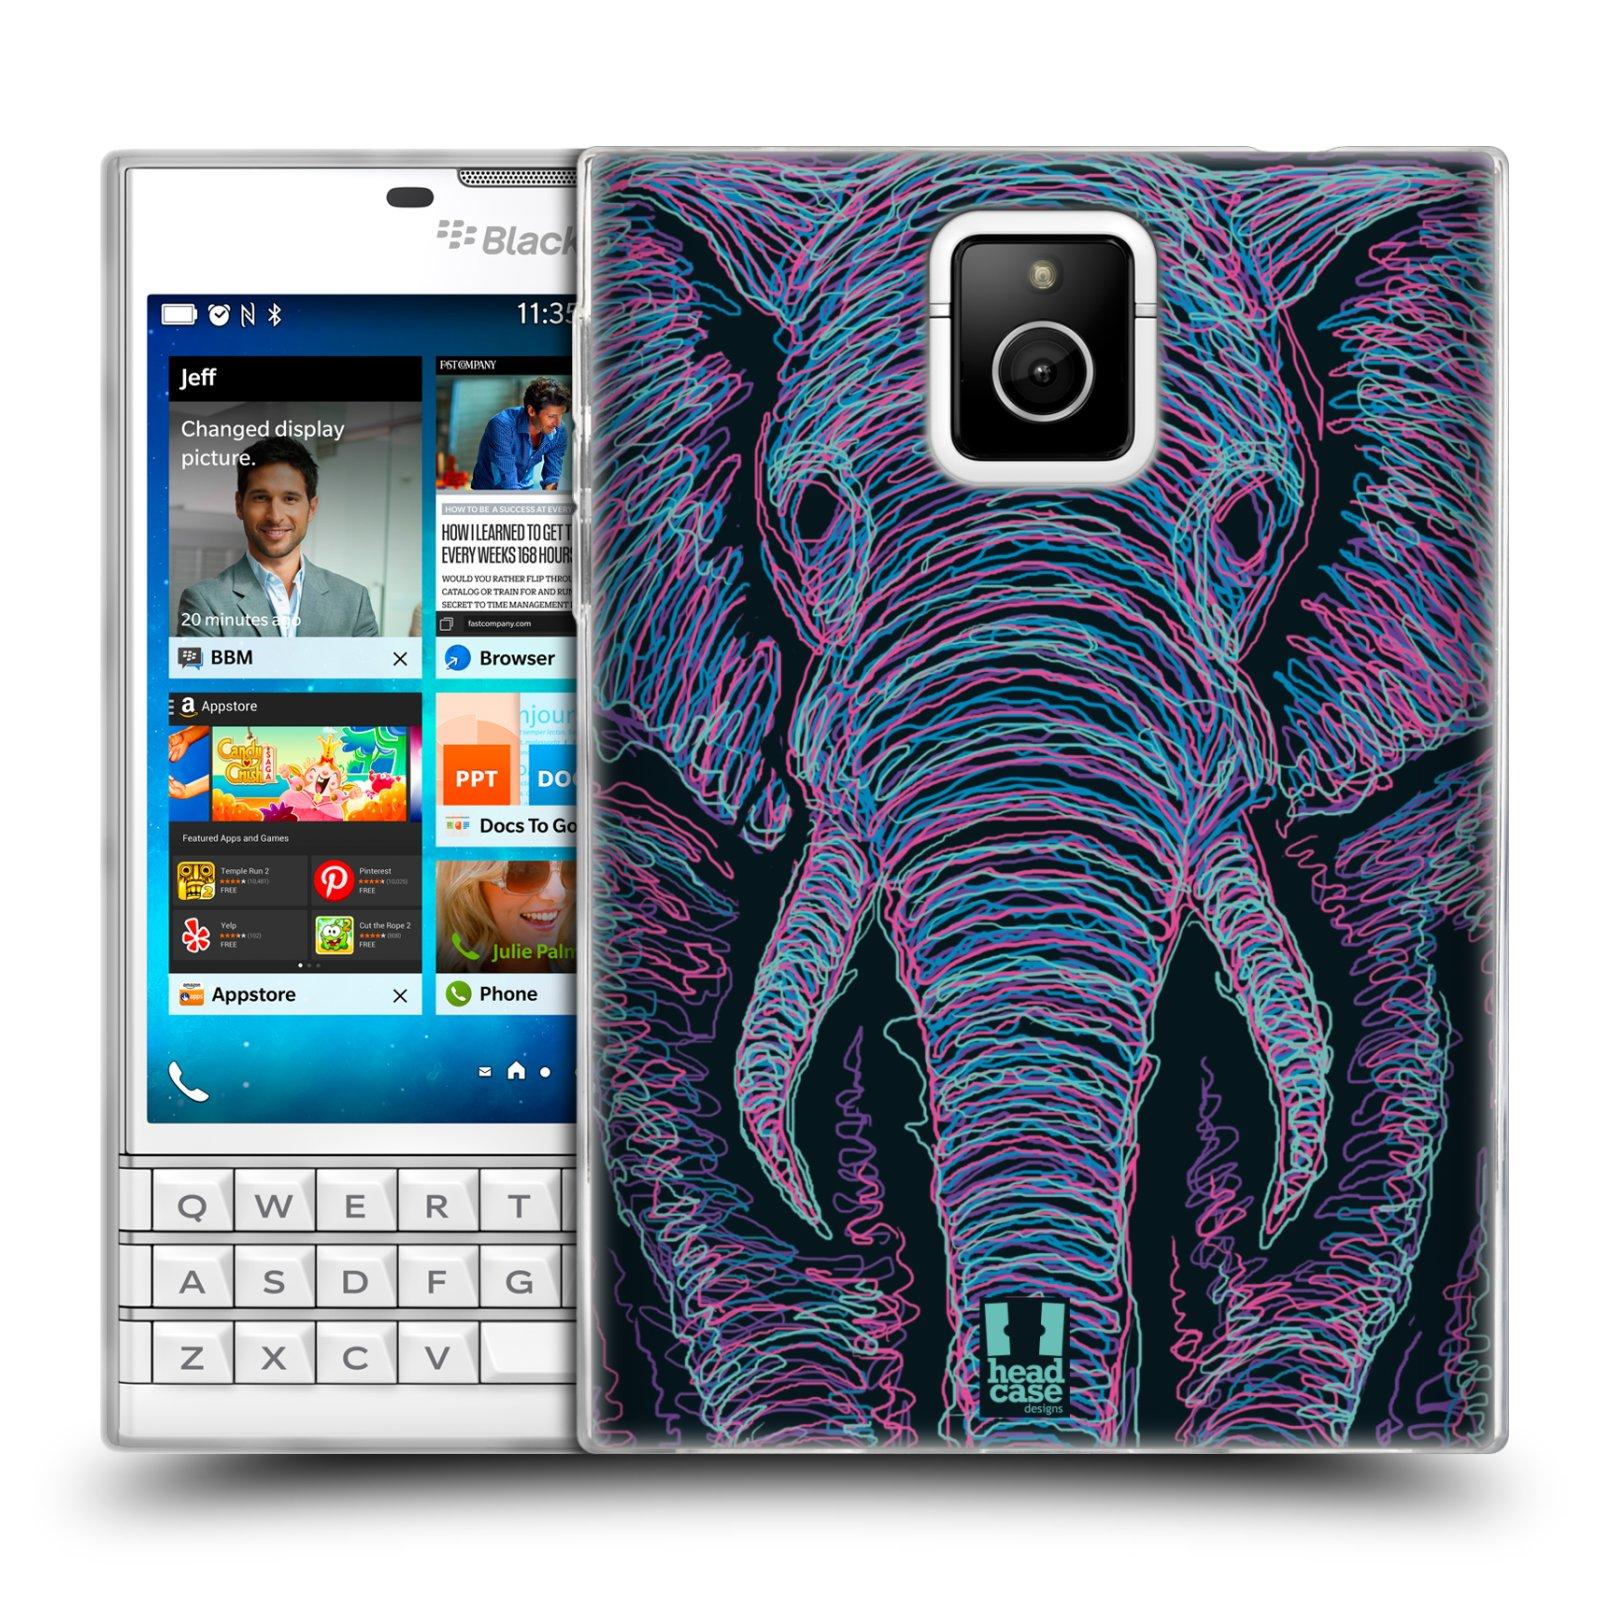 HEAD CASE silikonový obal na mobil Blackberry PASSPORT vzor zvíře čmáranice slon